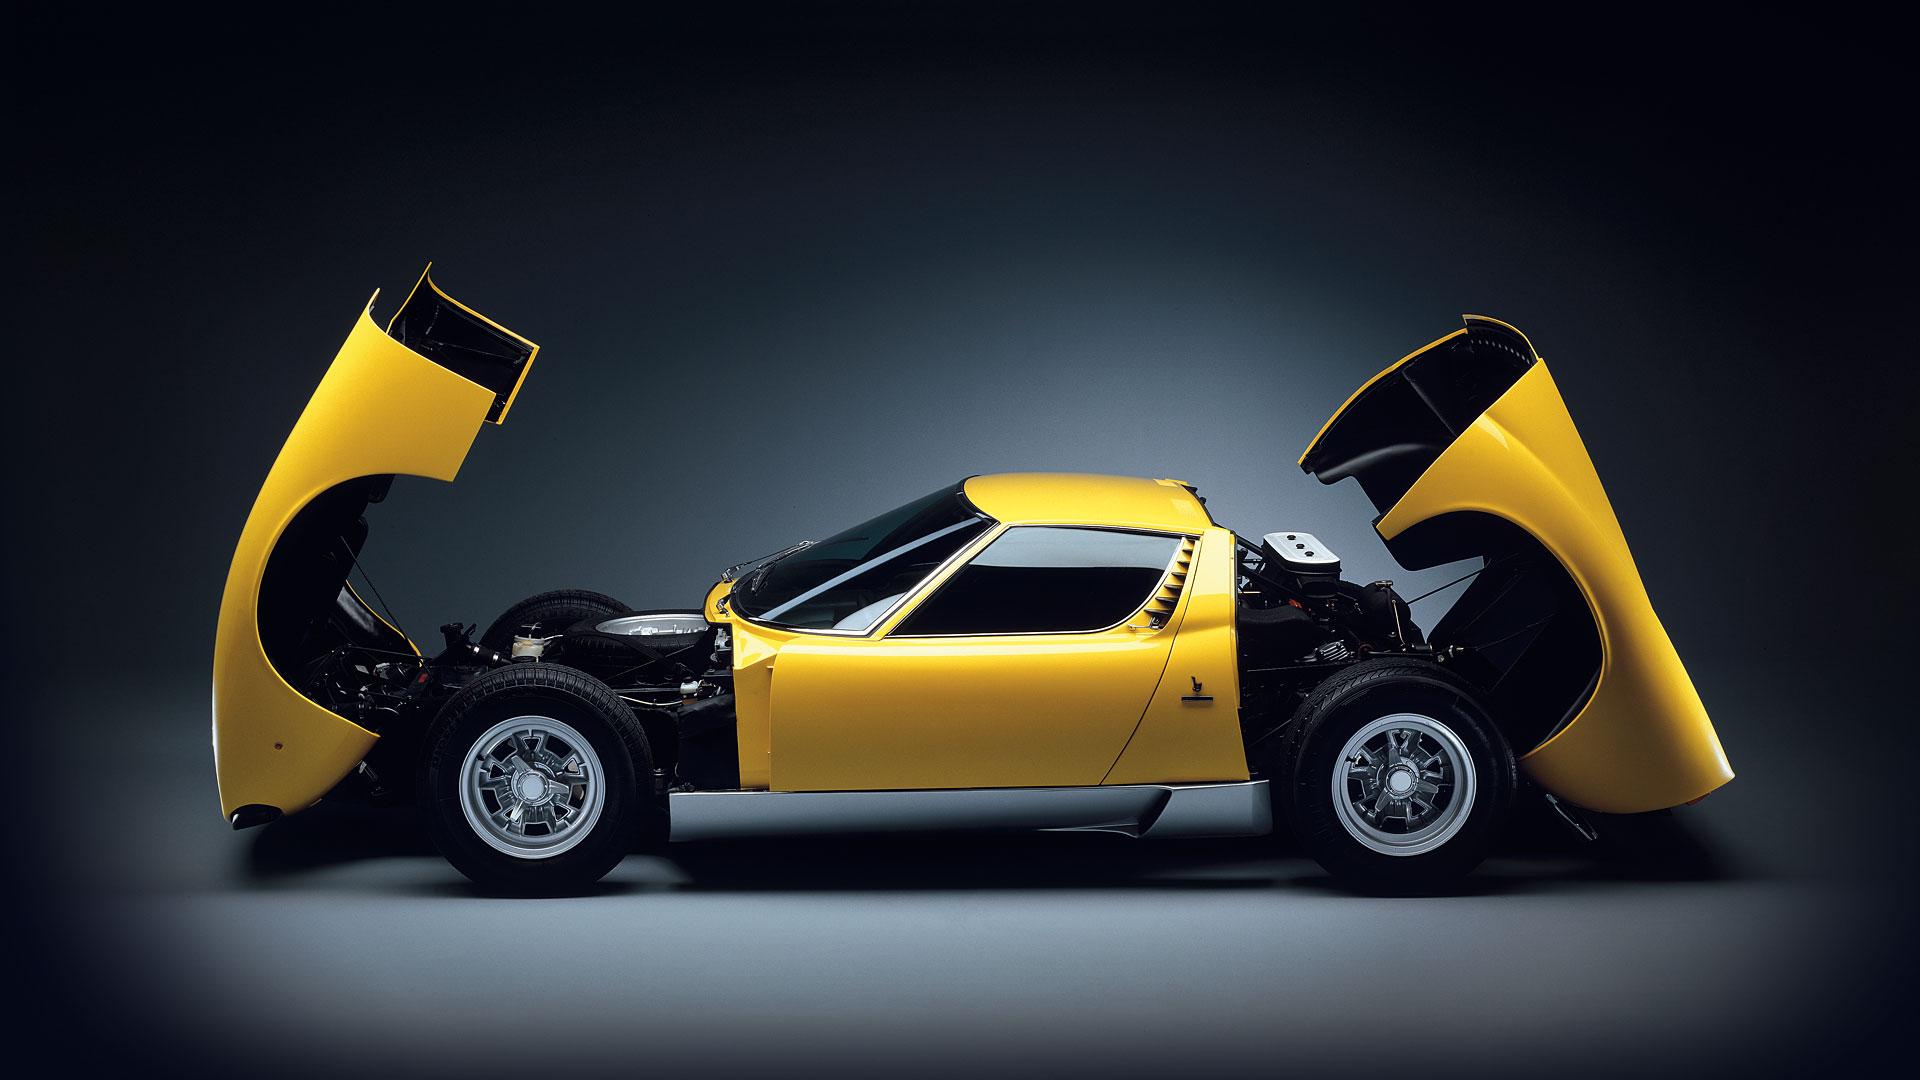 Lamborghini Miura - profil - capot ouvert / side-face - open